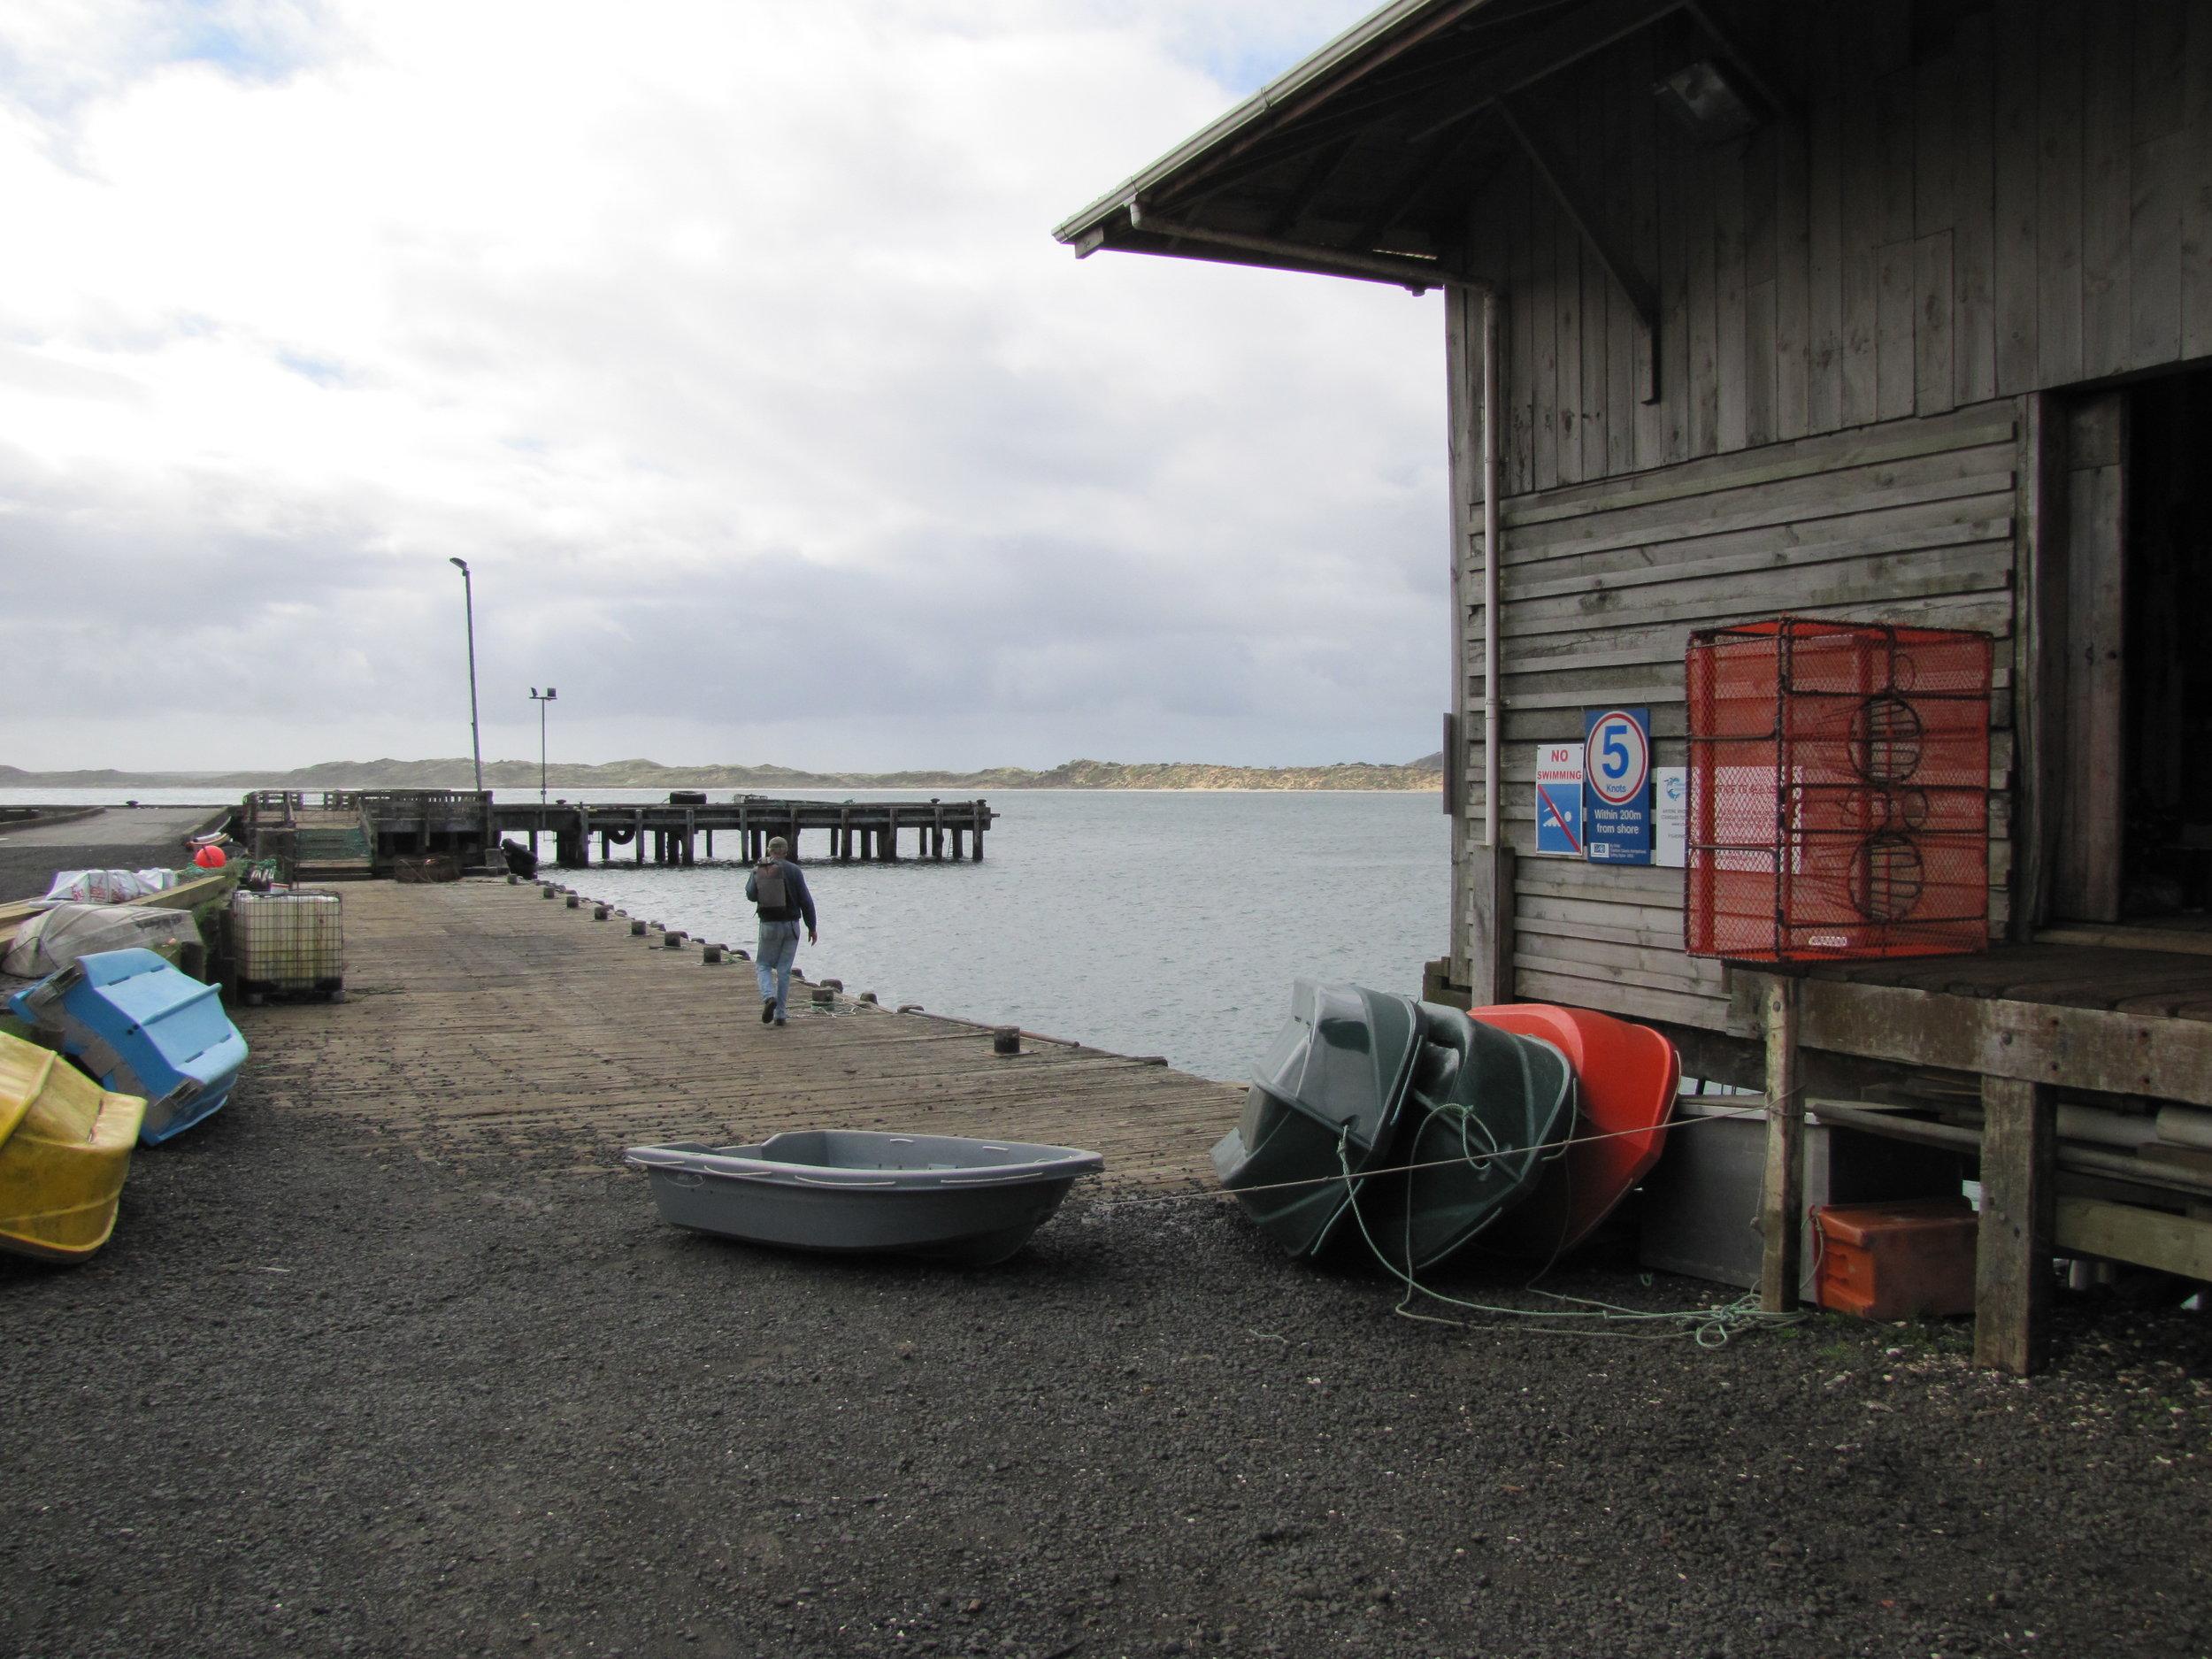 Checking the dinghy at the Waitangi wharf